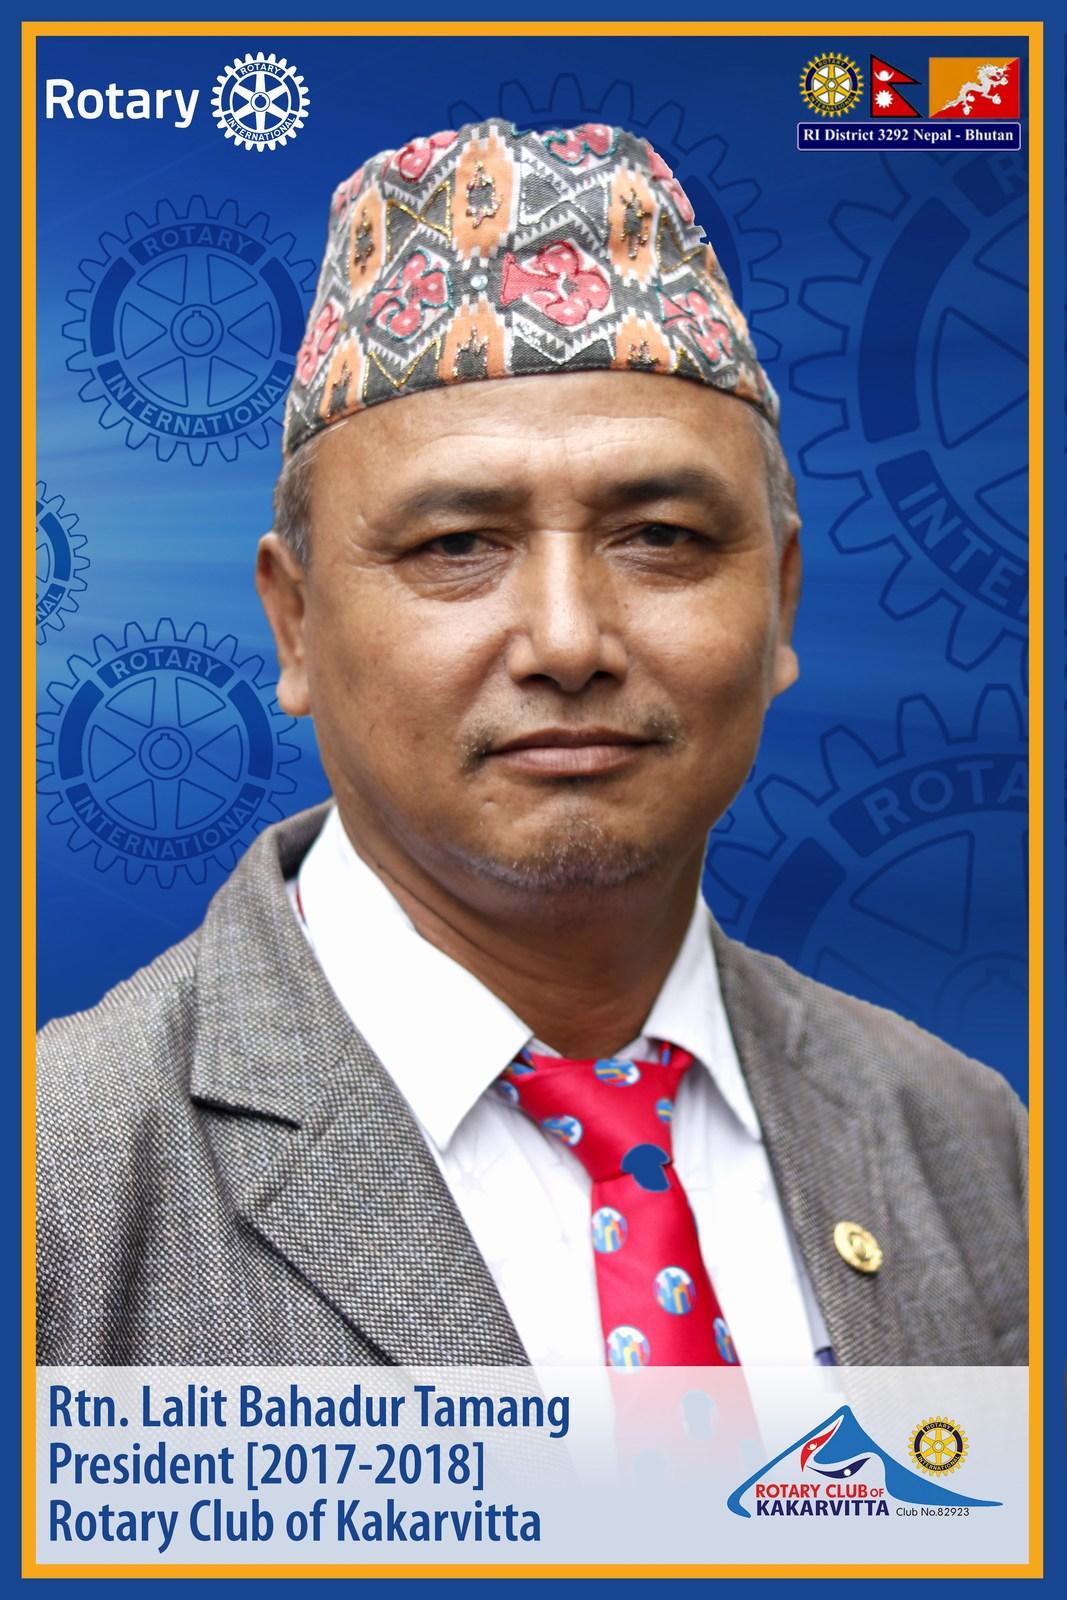 Rtn.-Lalit-BAhadur-Tamang-President-2017-18-Rotary-Club-of-Kakarvitta